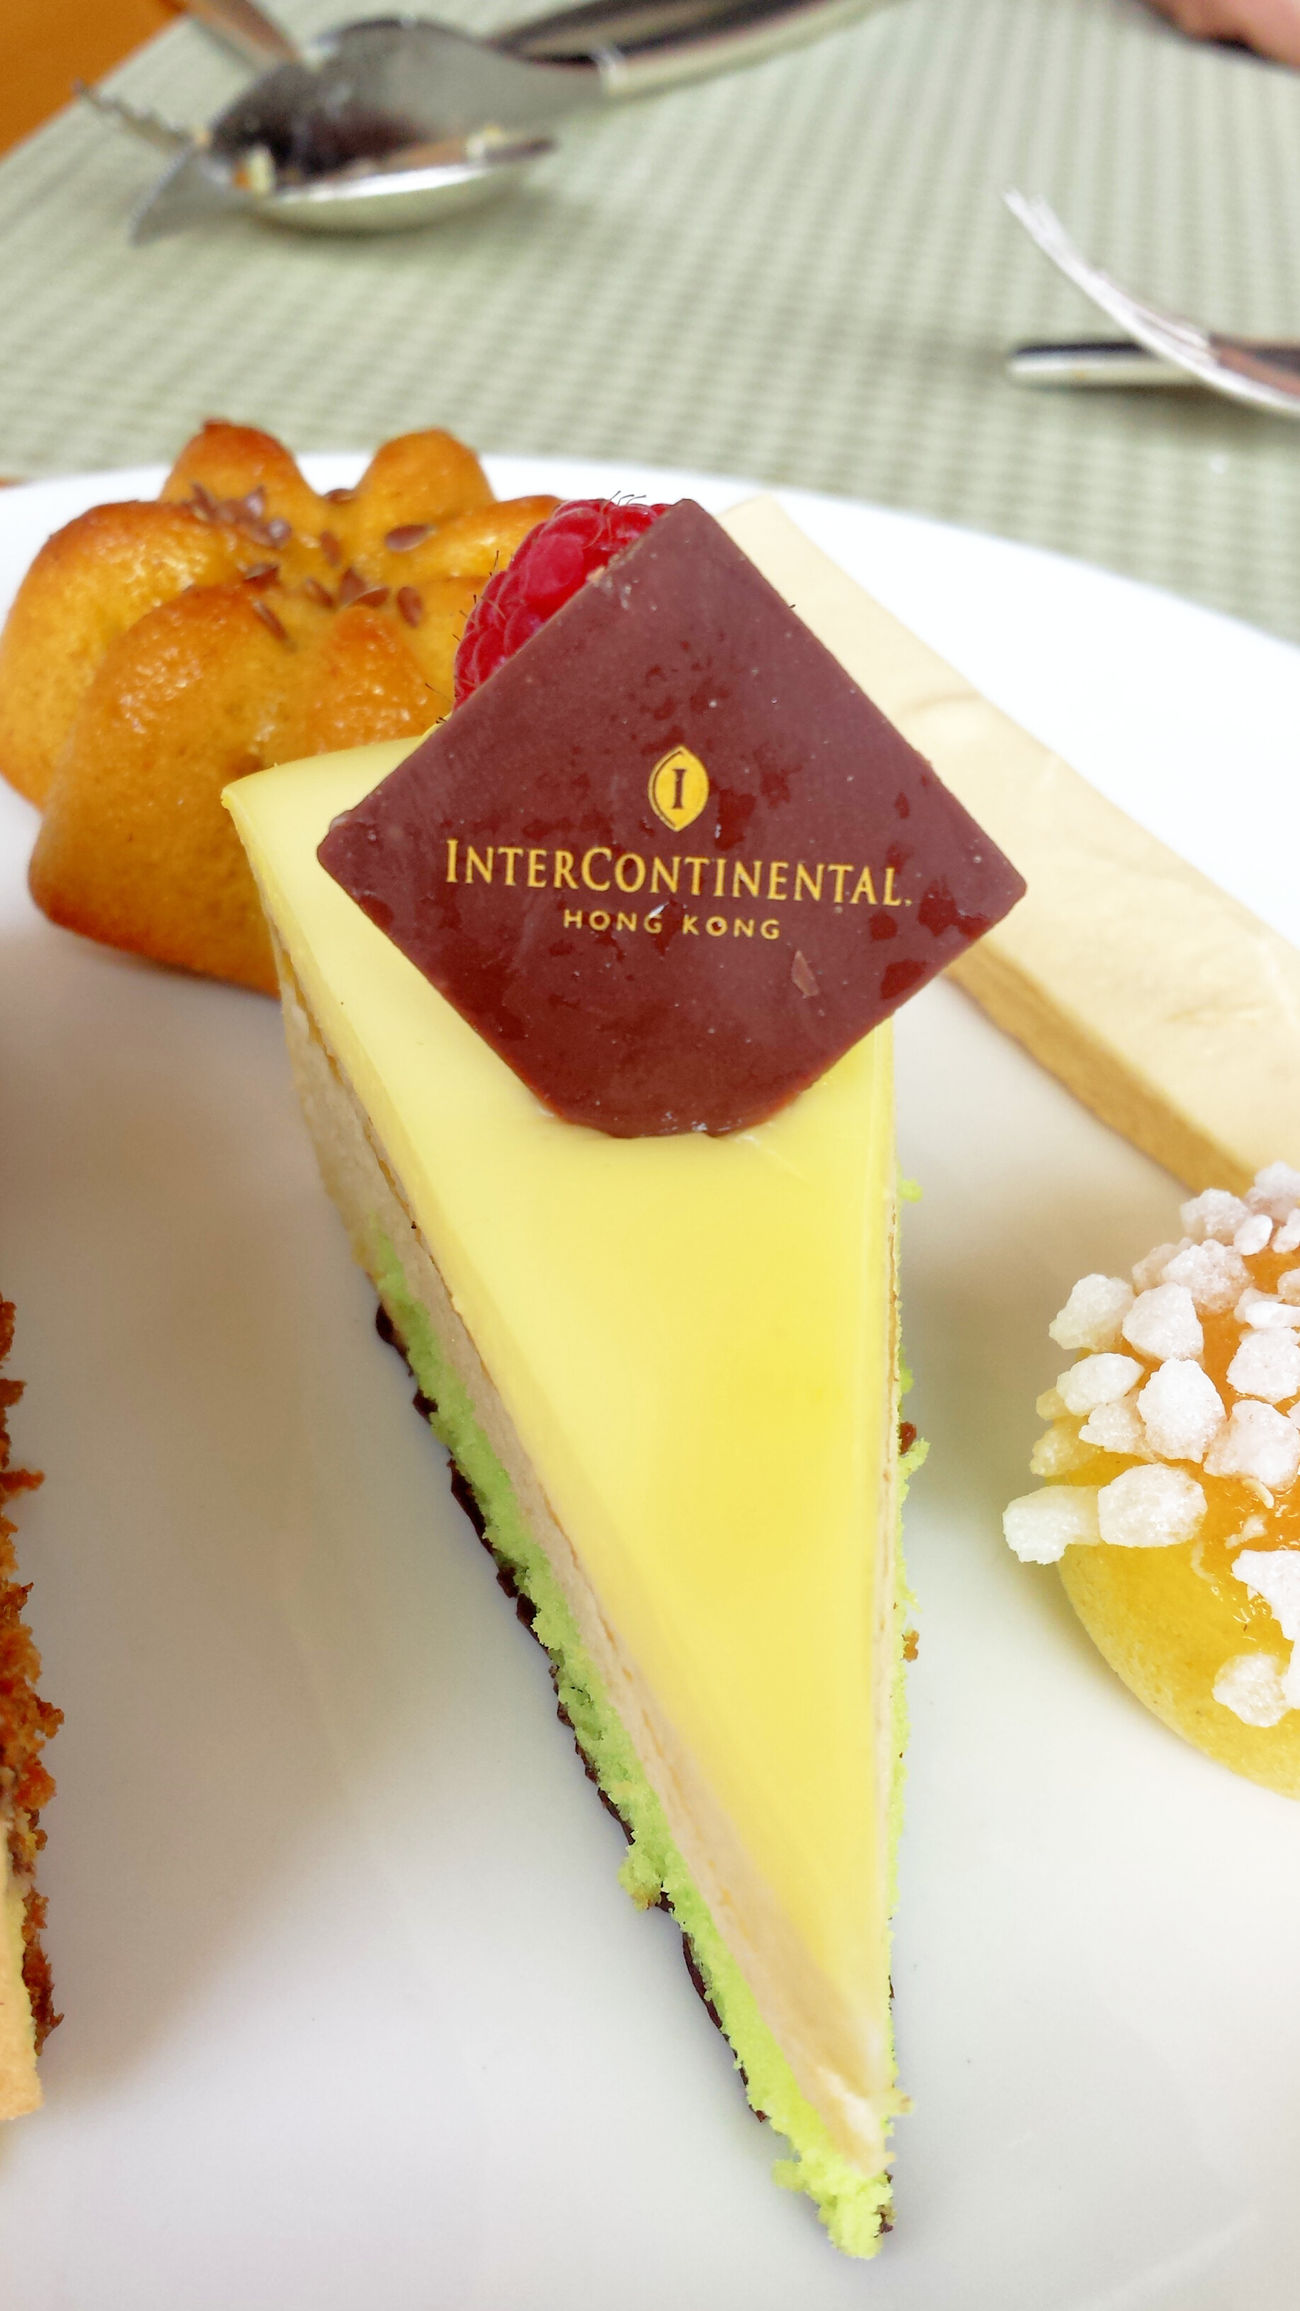 Intercontinental HK:) Intercontinentalhotel Hongkongfood Dessert